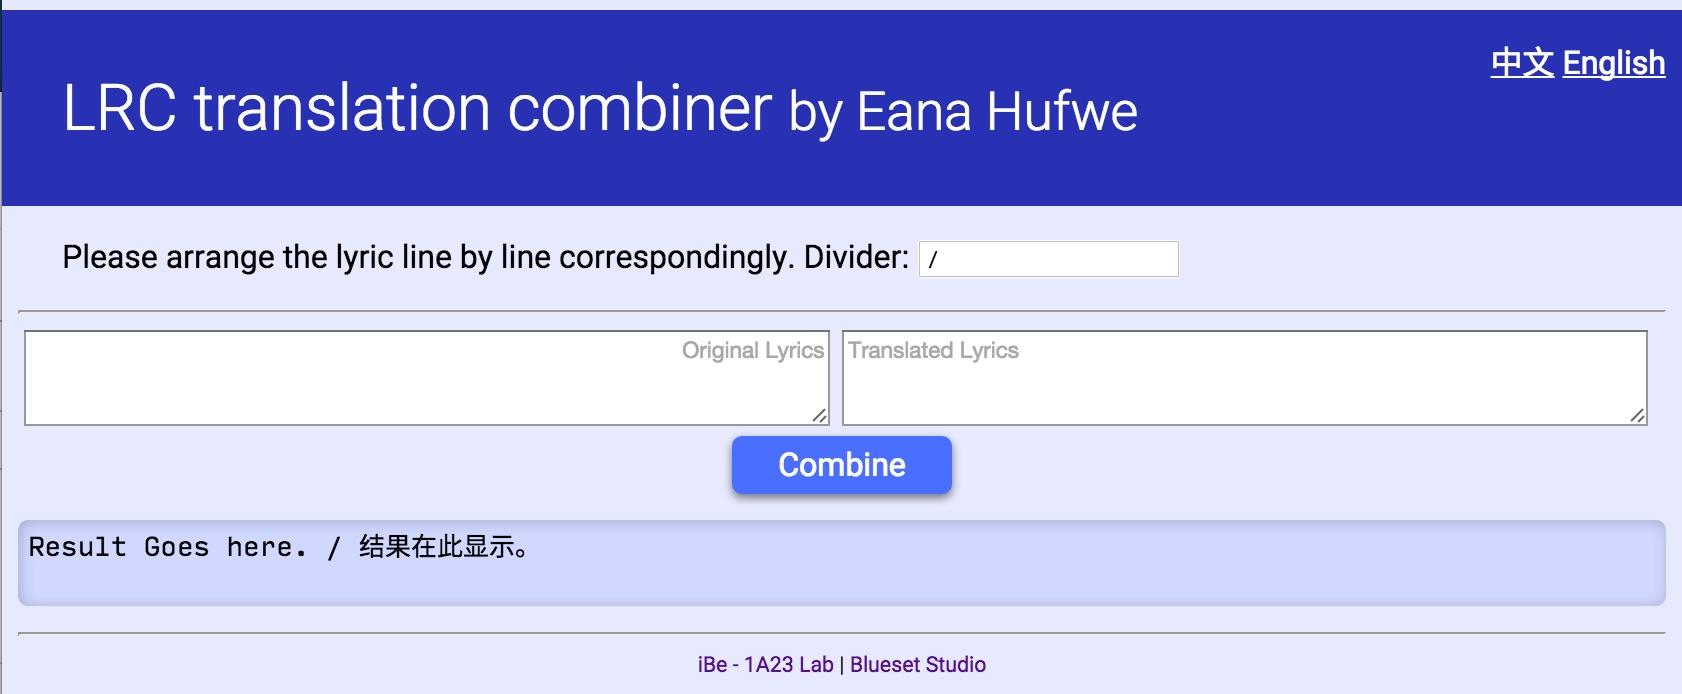 LRC Translation Combiner